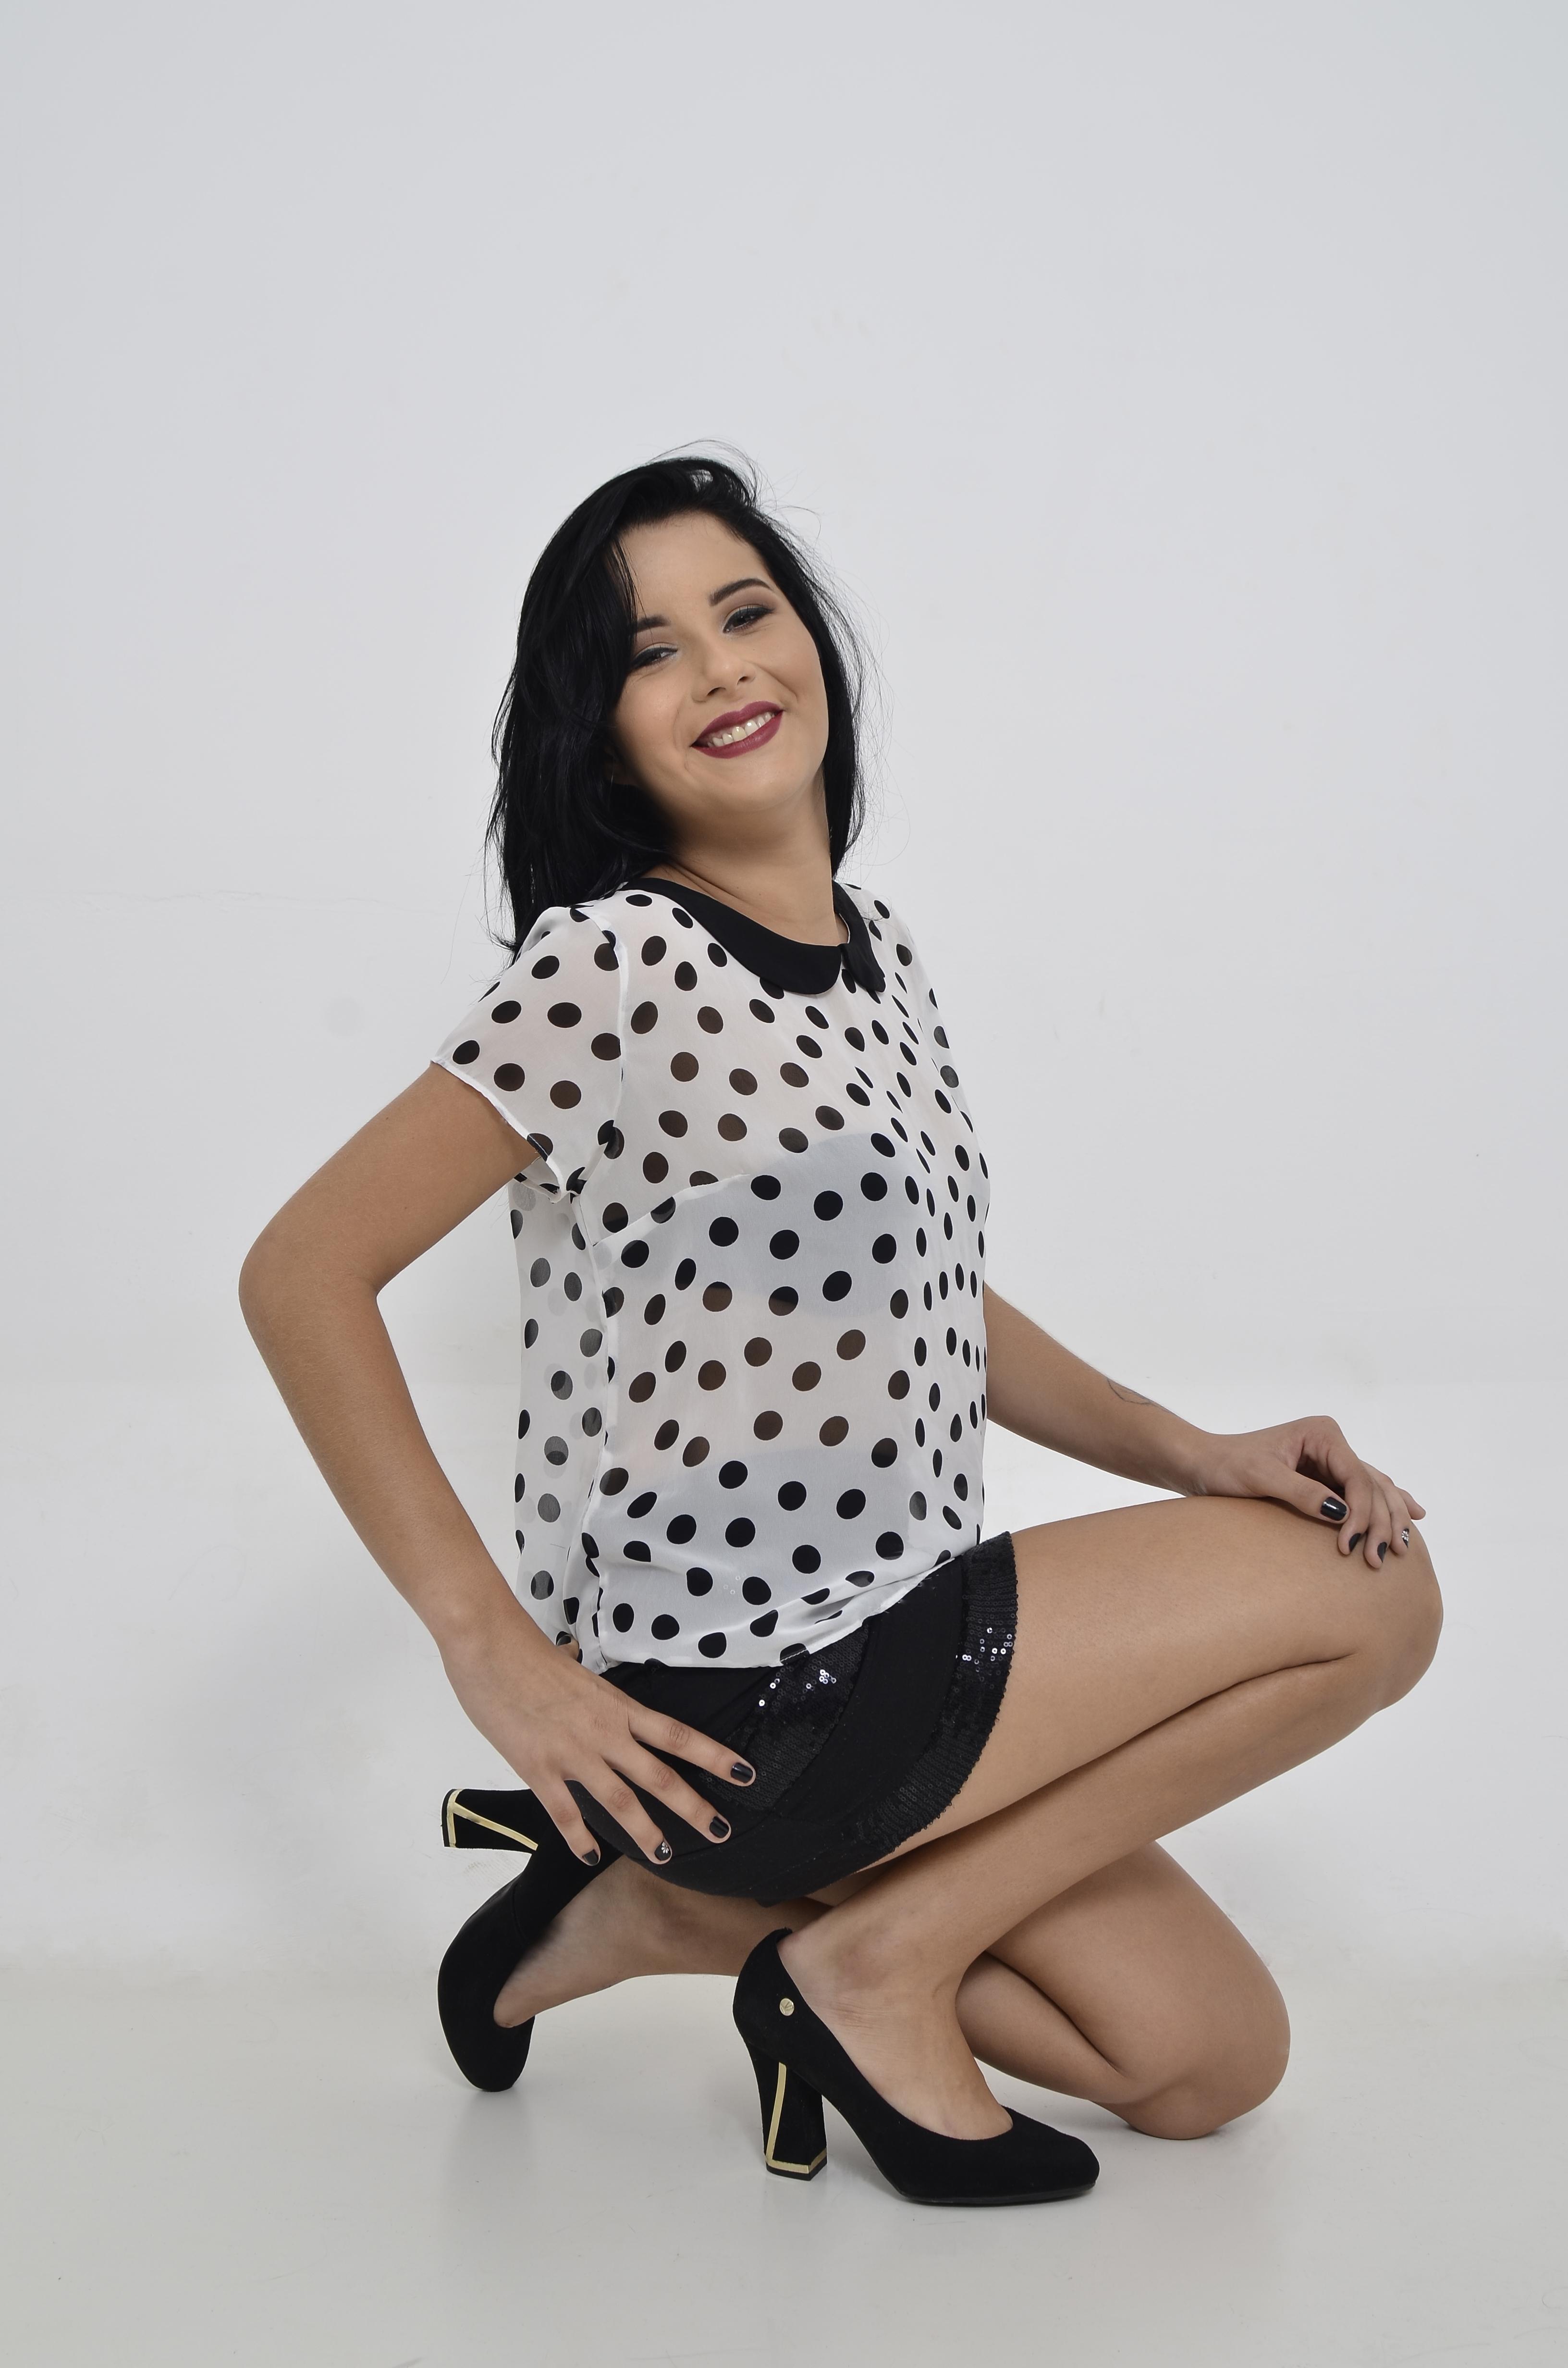 Ariely Silva